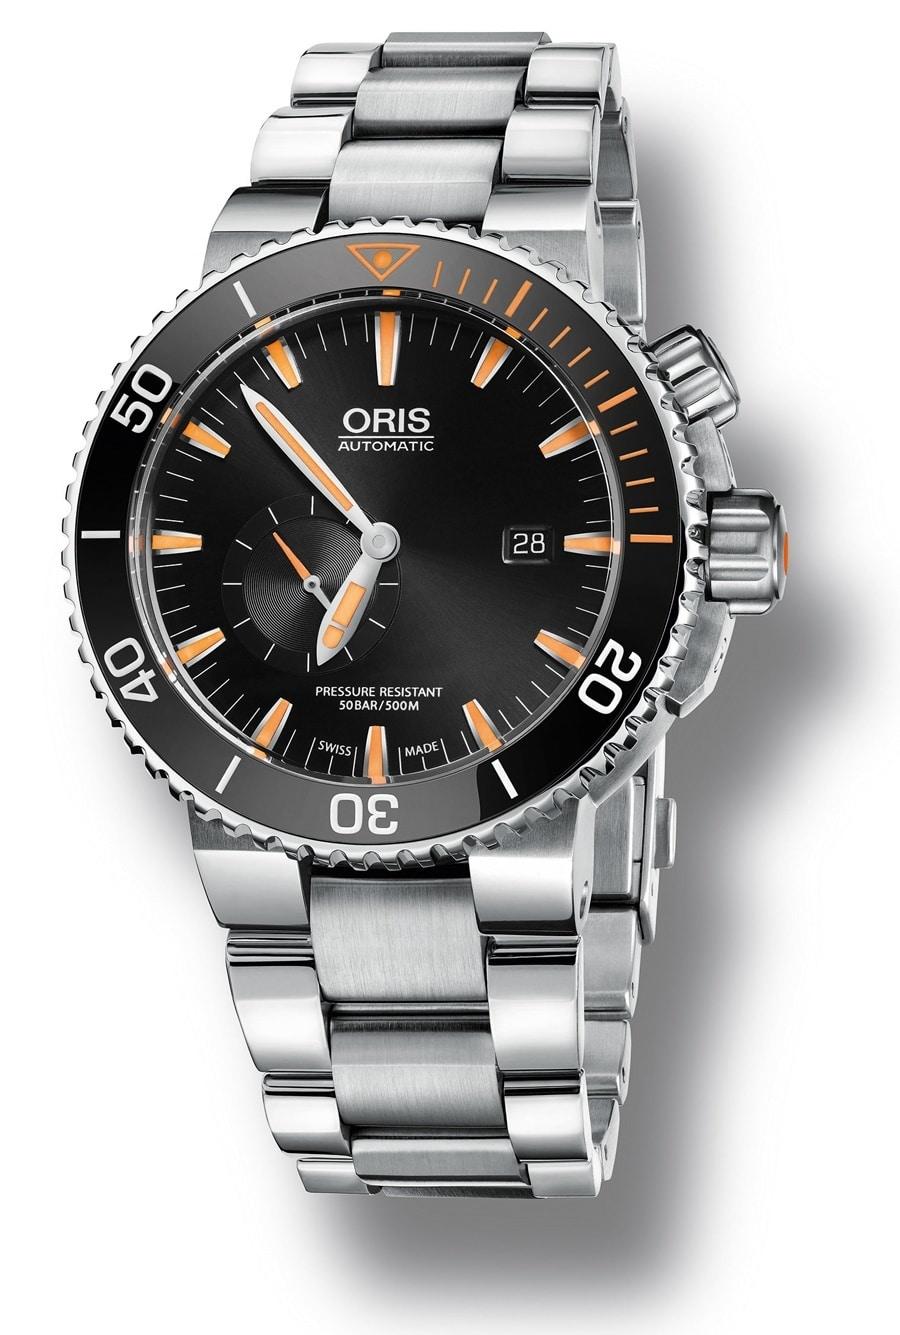 Die Oris Carlos Coste Limited Edition IV gibt es am Titanband...